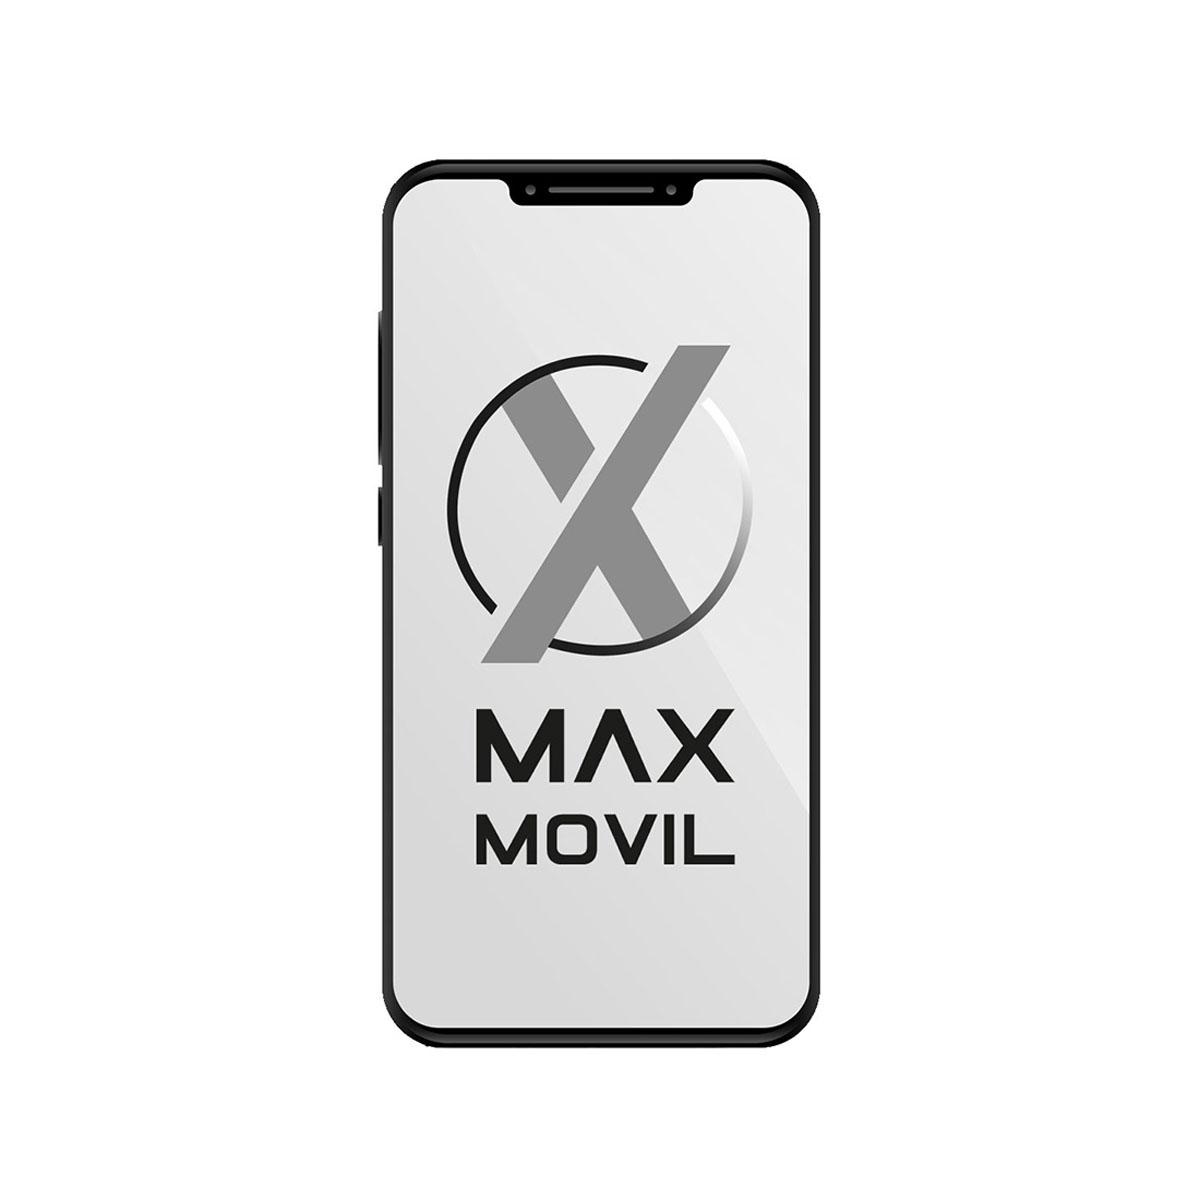 Comprar huawei p8 champ n libre maxmovil for Huawei p8 te koop